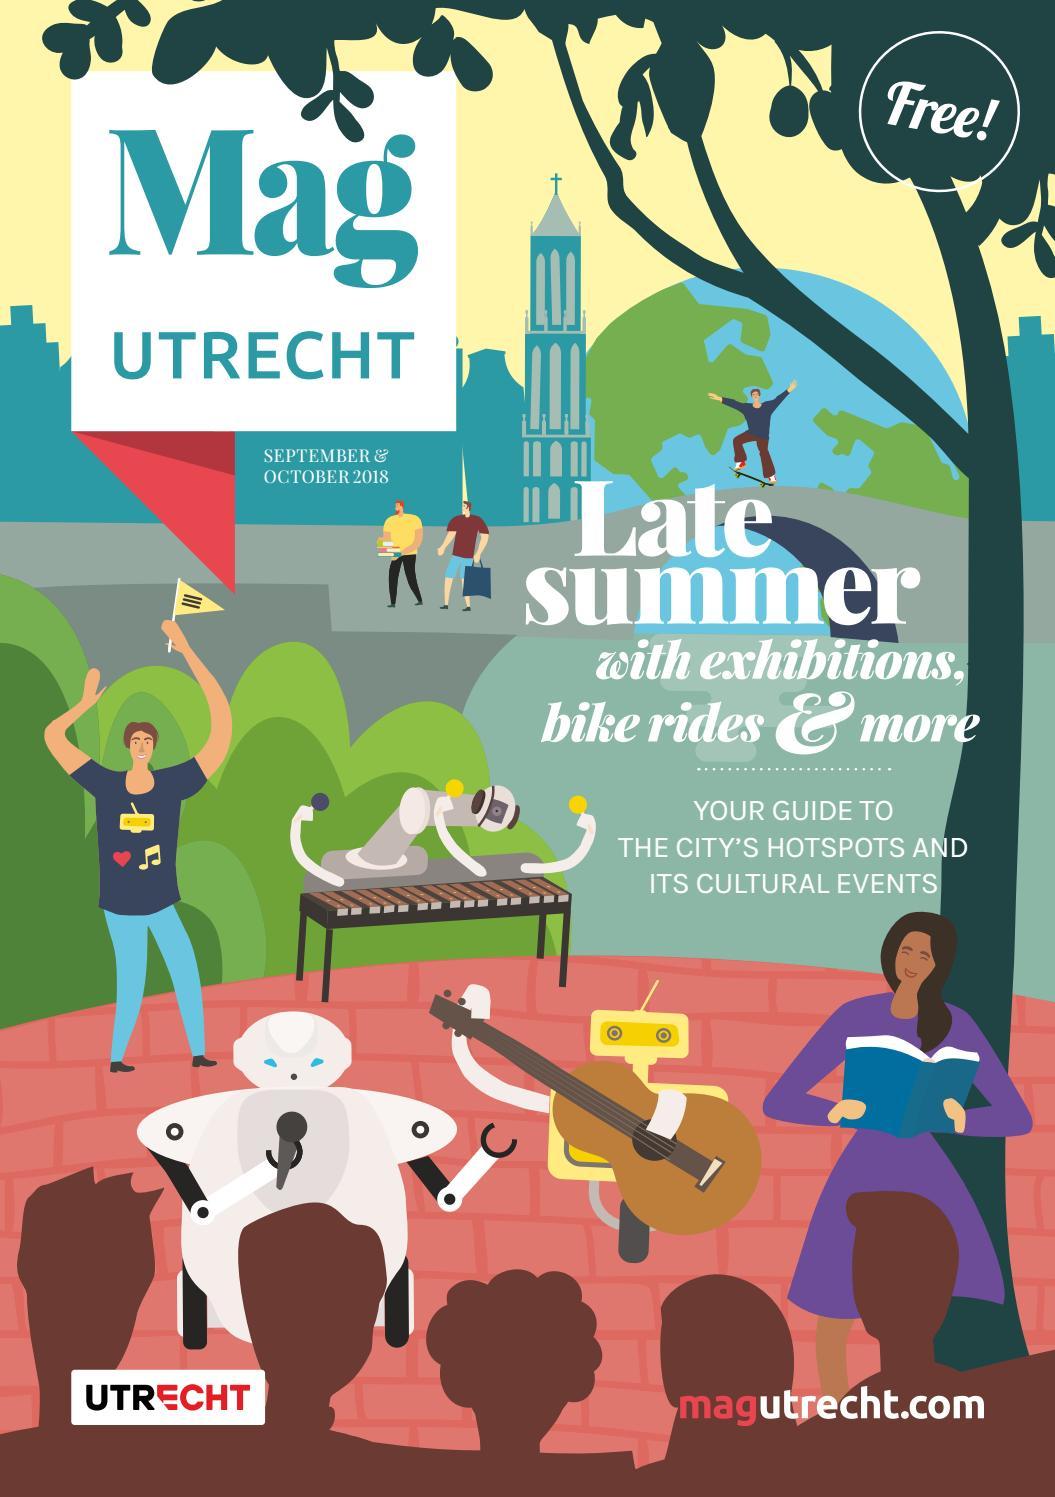 MAG Utrecht #13: September & October 2018 by magutrecht - issuu